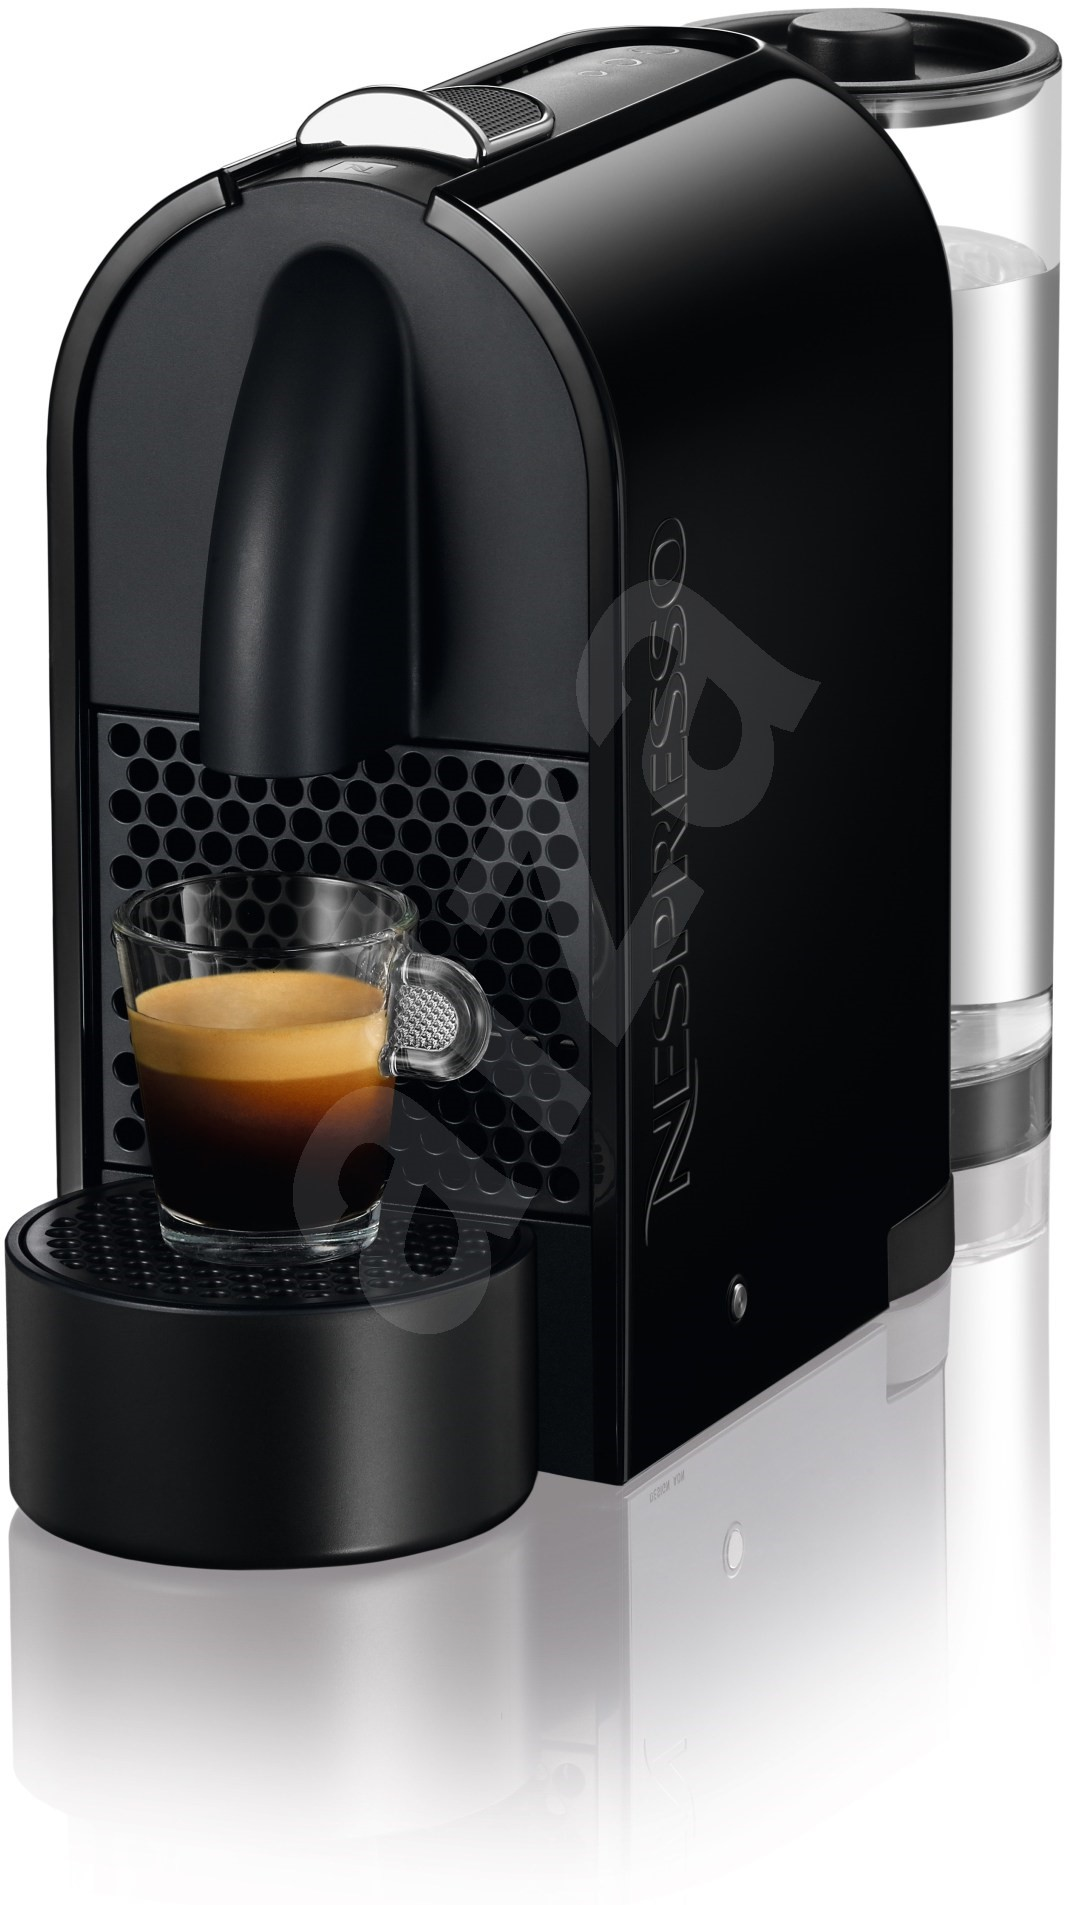 nespresso delonghi u en110 b black automatic coffee machine. Black Bedroom Furniture Sets. Home Design Ideas